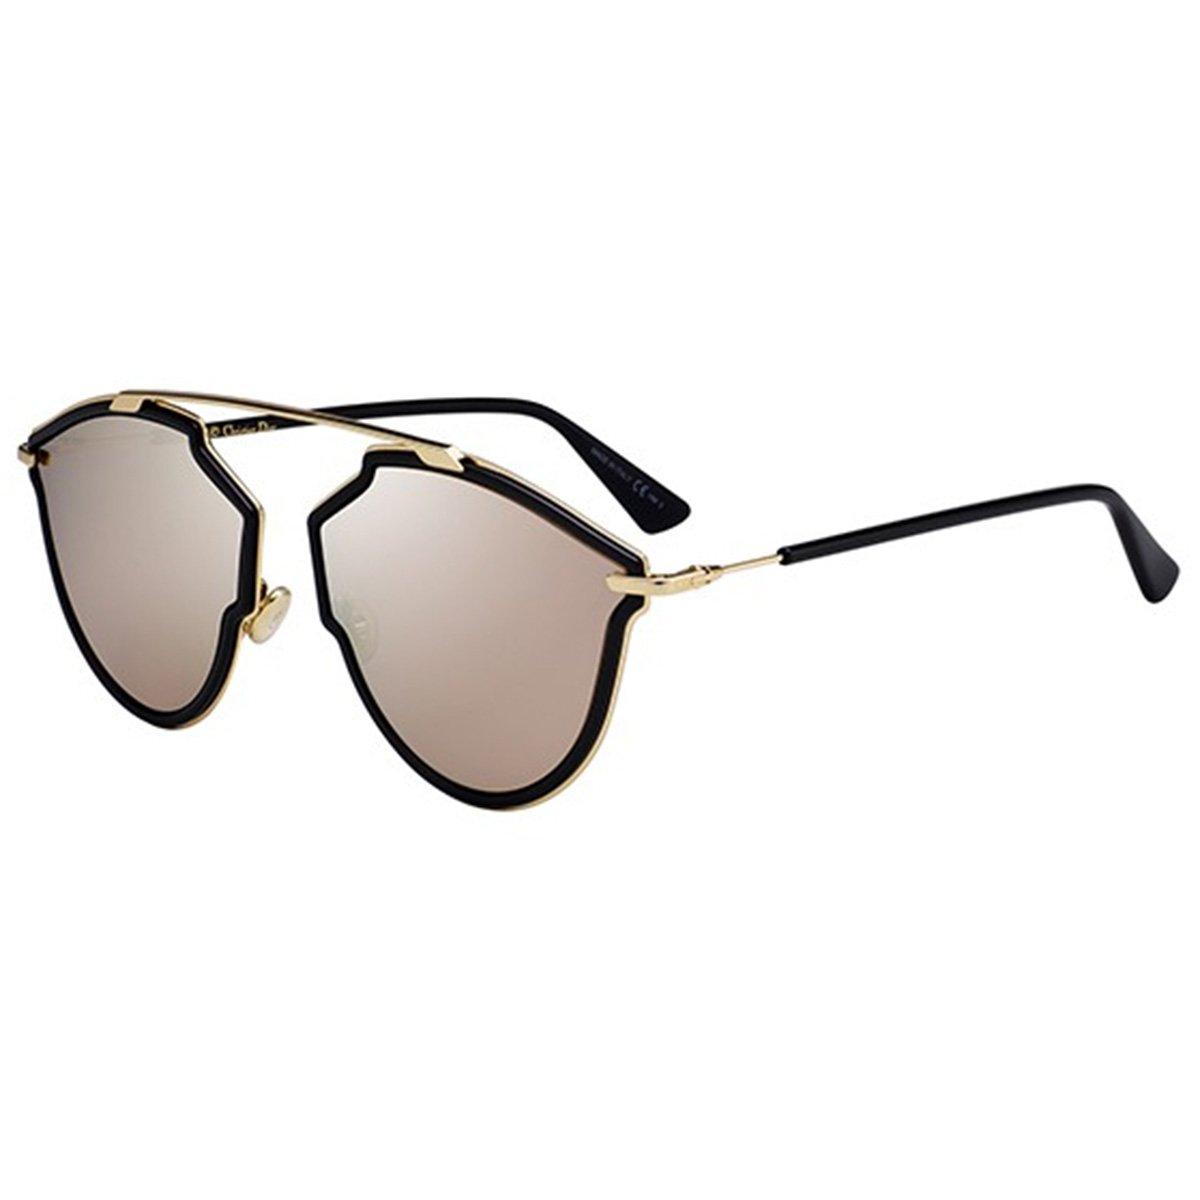 7714d5760e9f4 Compre Óculos de Sol Dior Soreal Rise em 10X   Tri-Jóia Shop